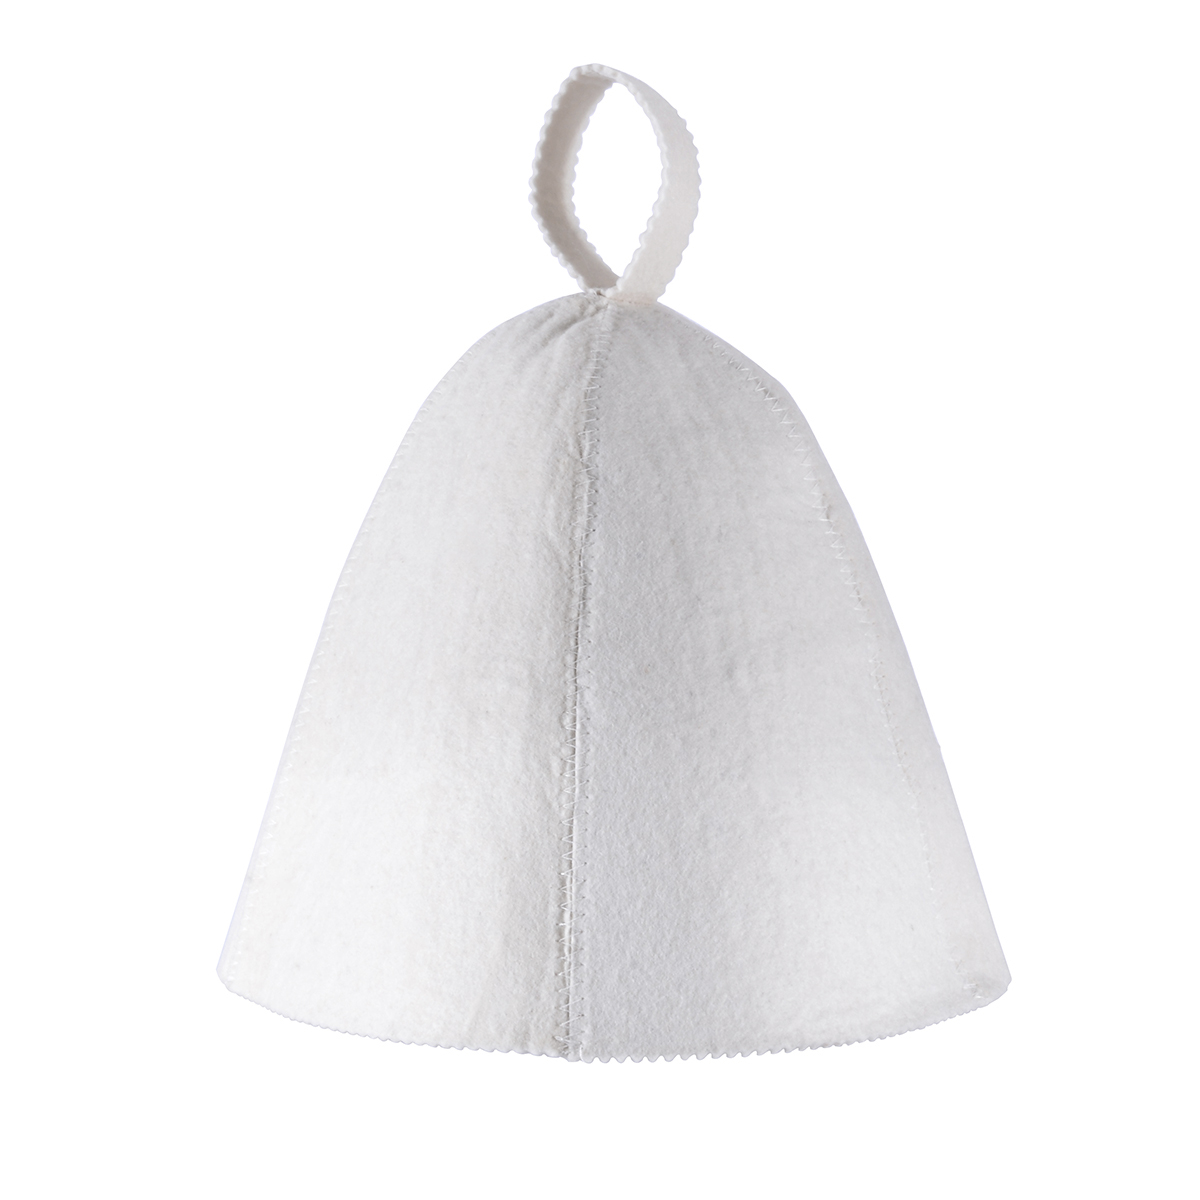 Classic Soft Wool Felt Sauna Steam Hat Bath Supply Cap Diameter 22cm Cute Shower Caps for Beauty Decor in Party Favors from Home Garden